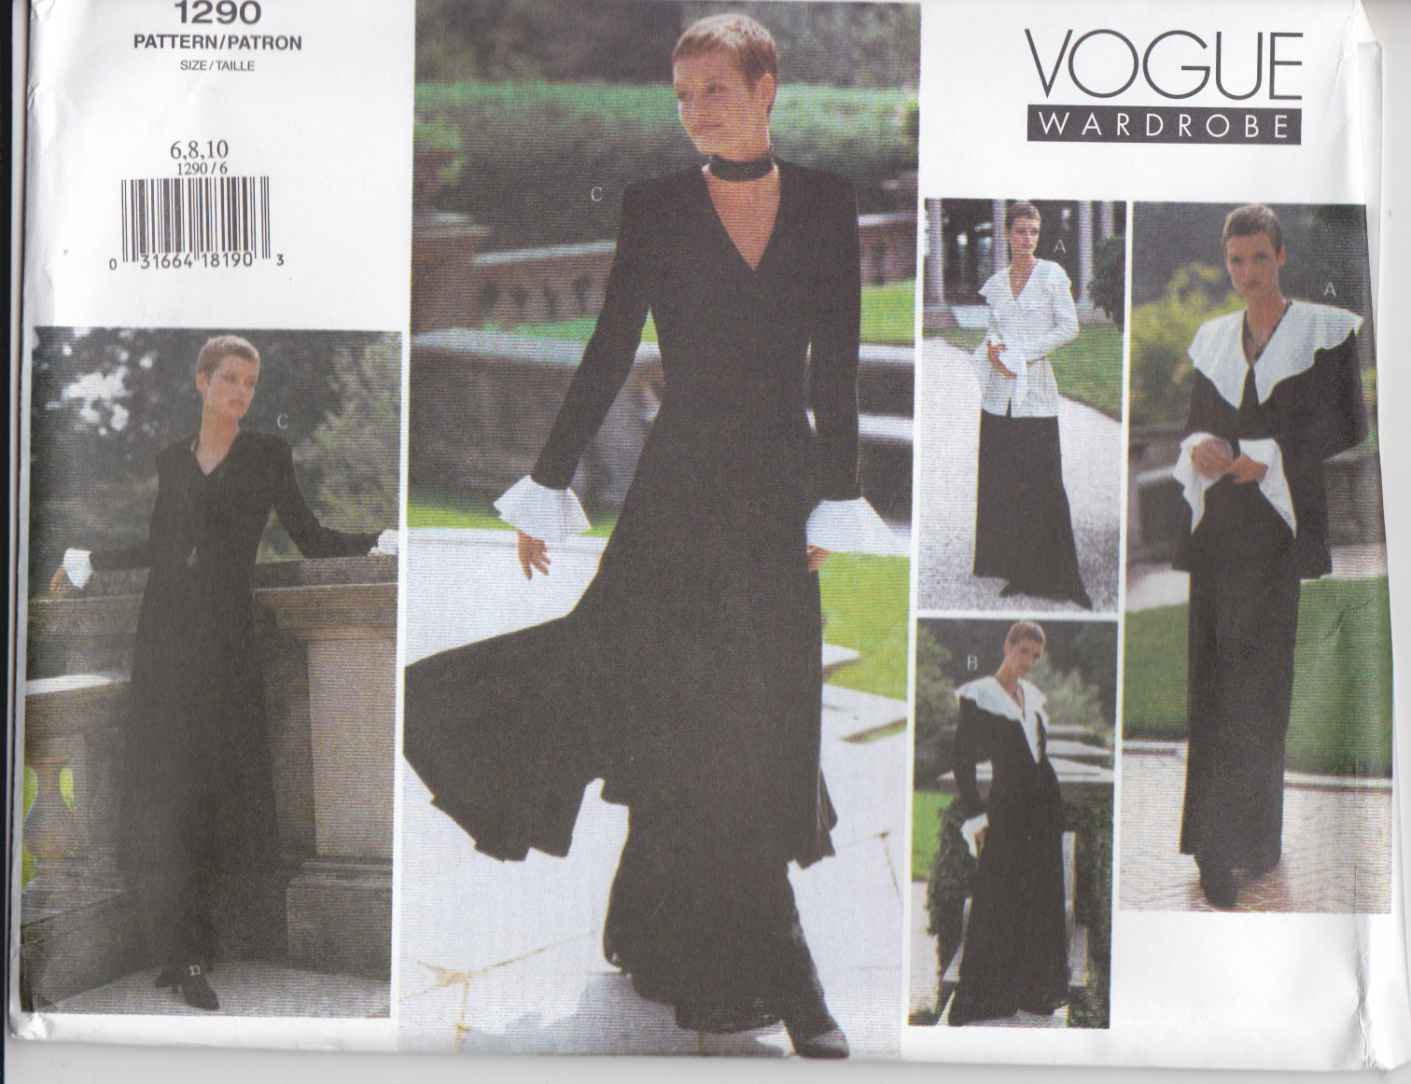 Vogue Sewing Pattern 1290 Misses Size 12-16 Easy Wardrobe Jacket Dress Top Pants